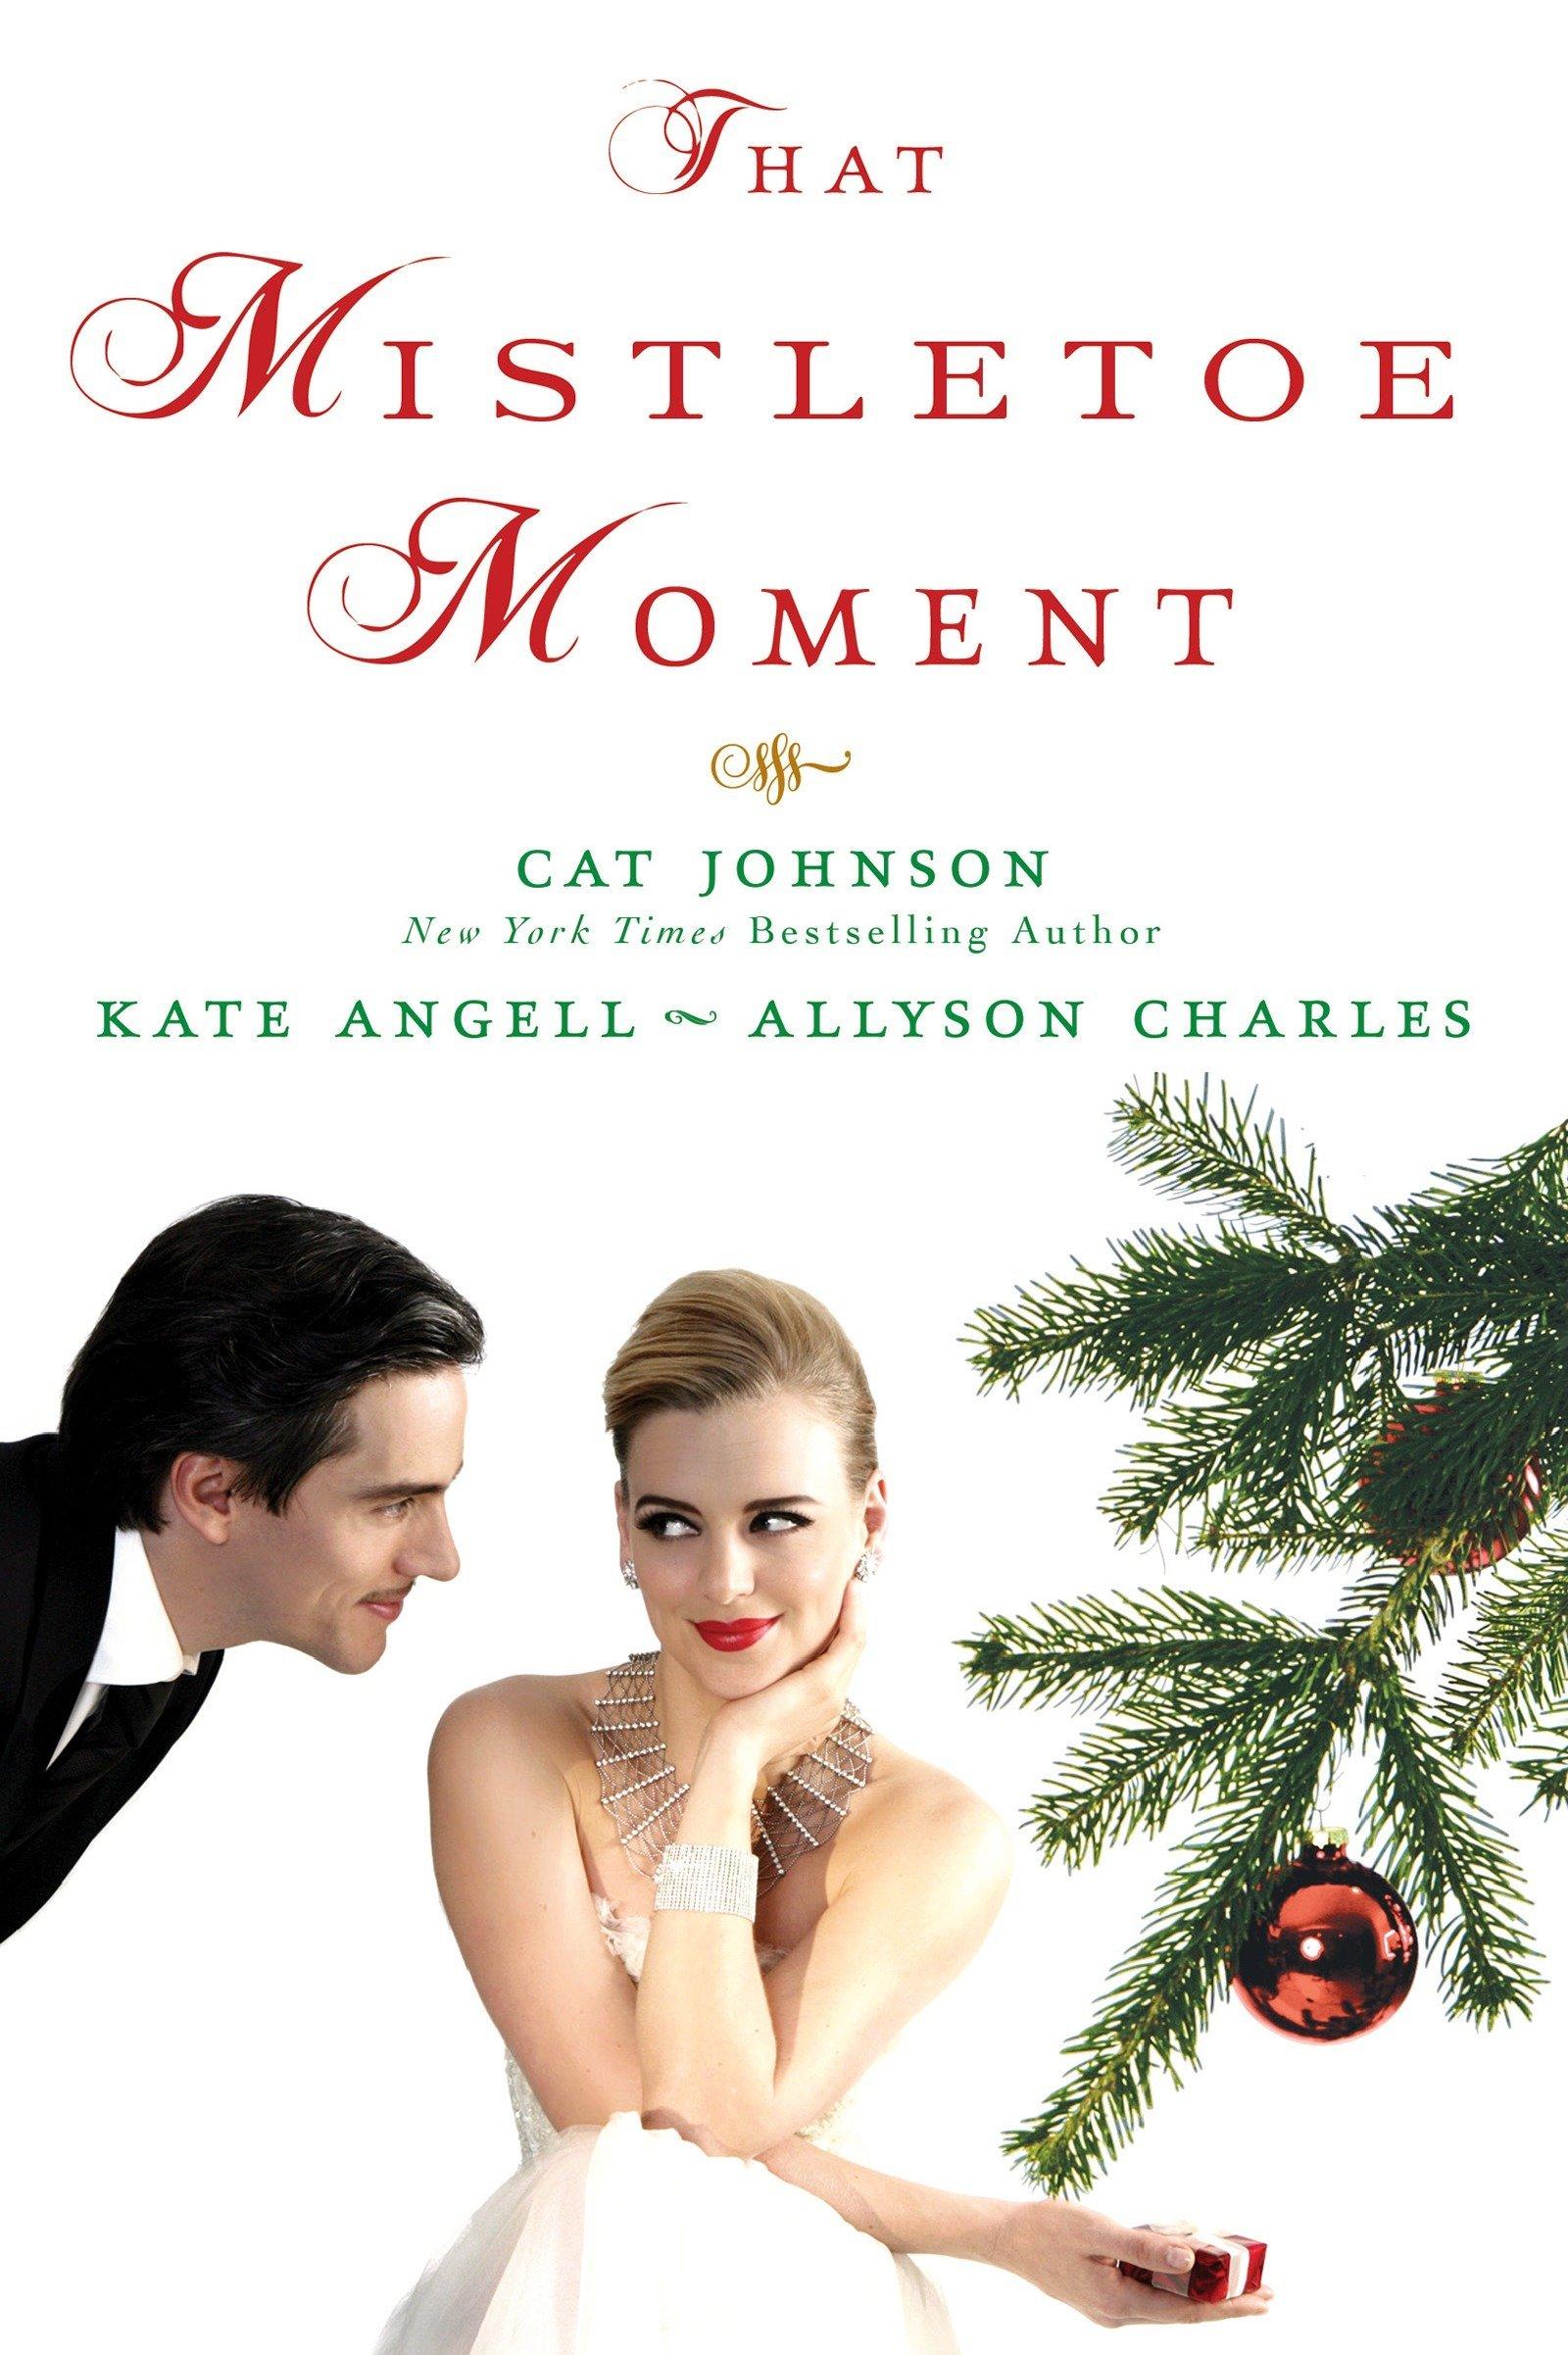 Amazon.com: That Mistletoe Moment (9781496705570): Cat Johnson, Kate ...